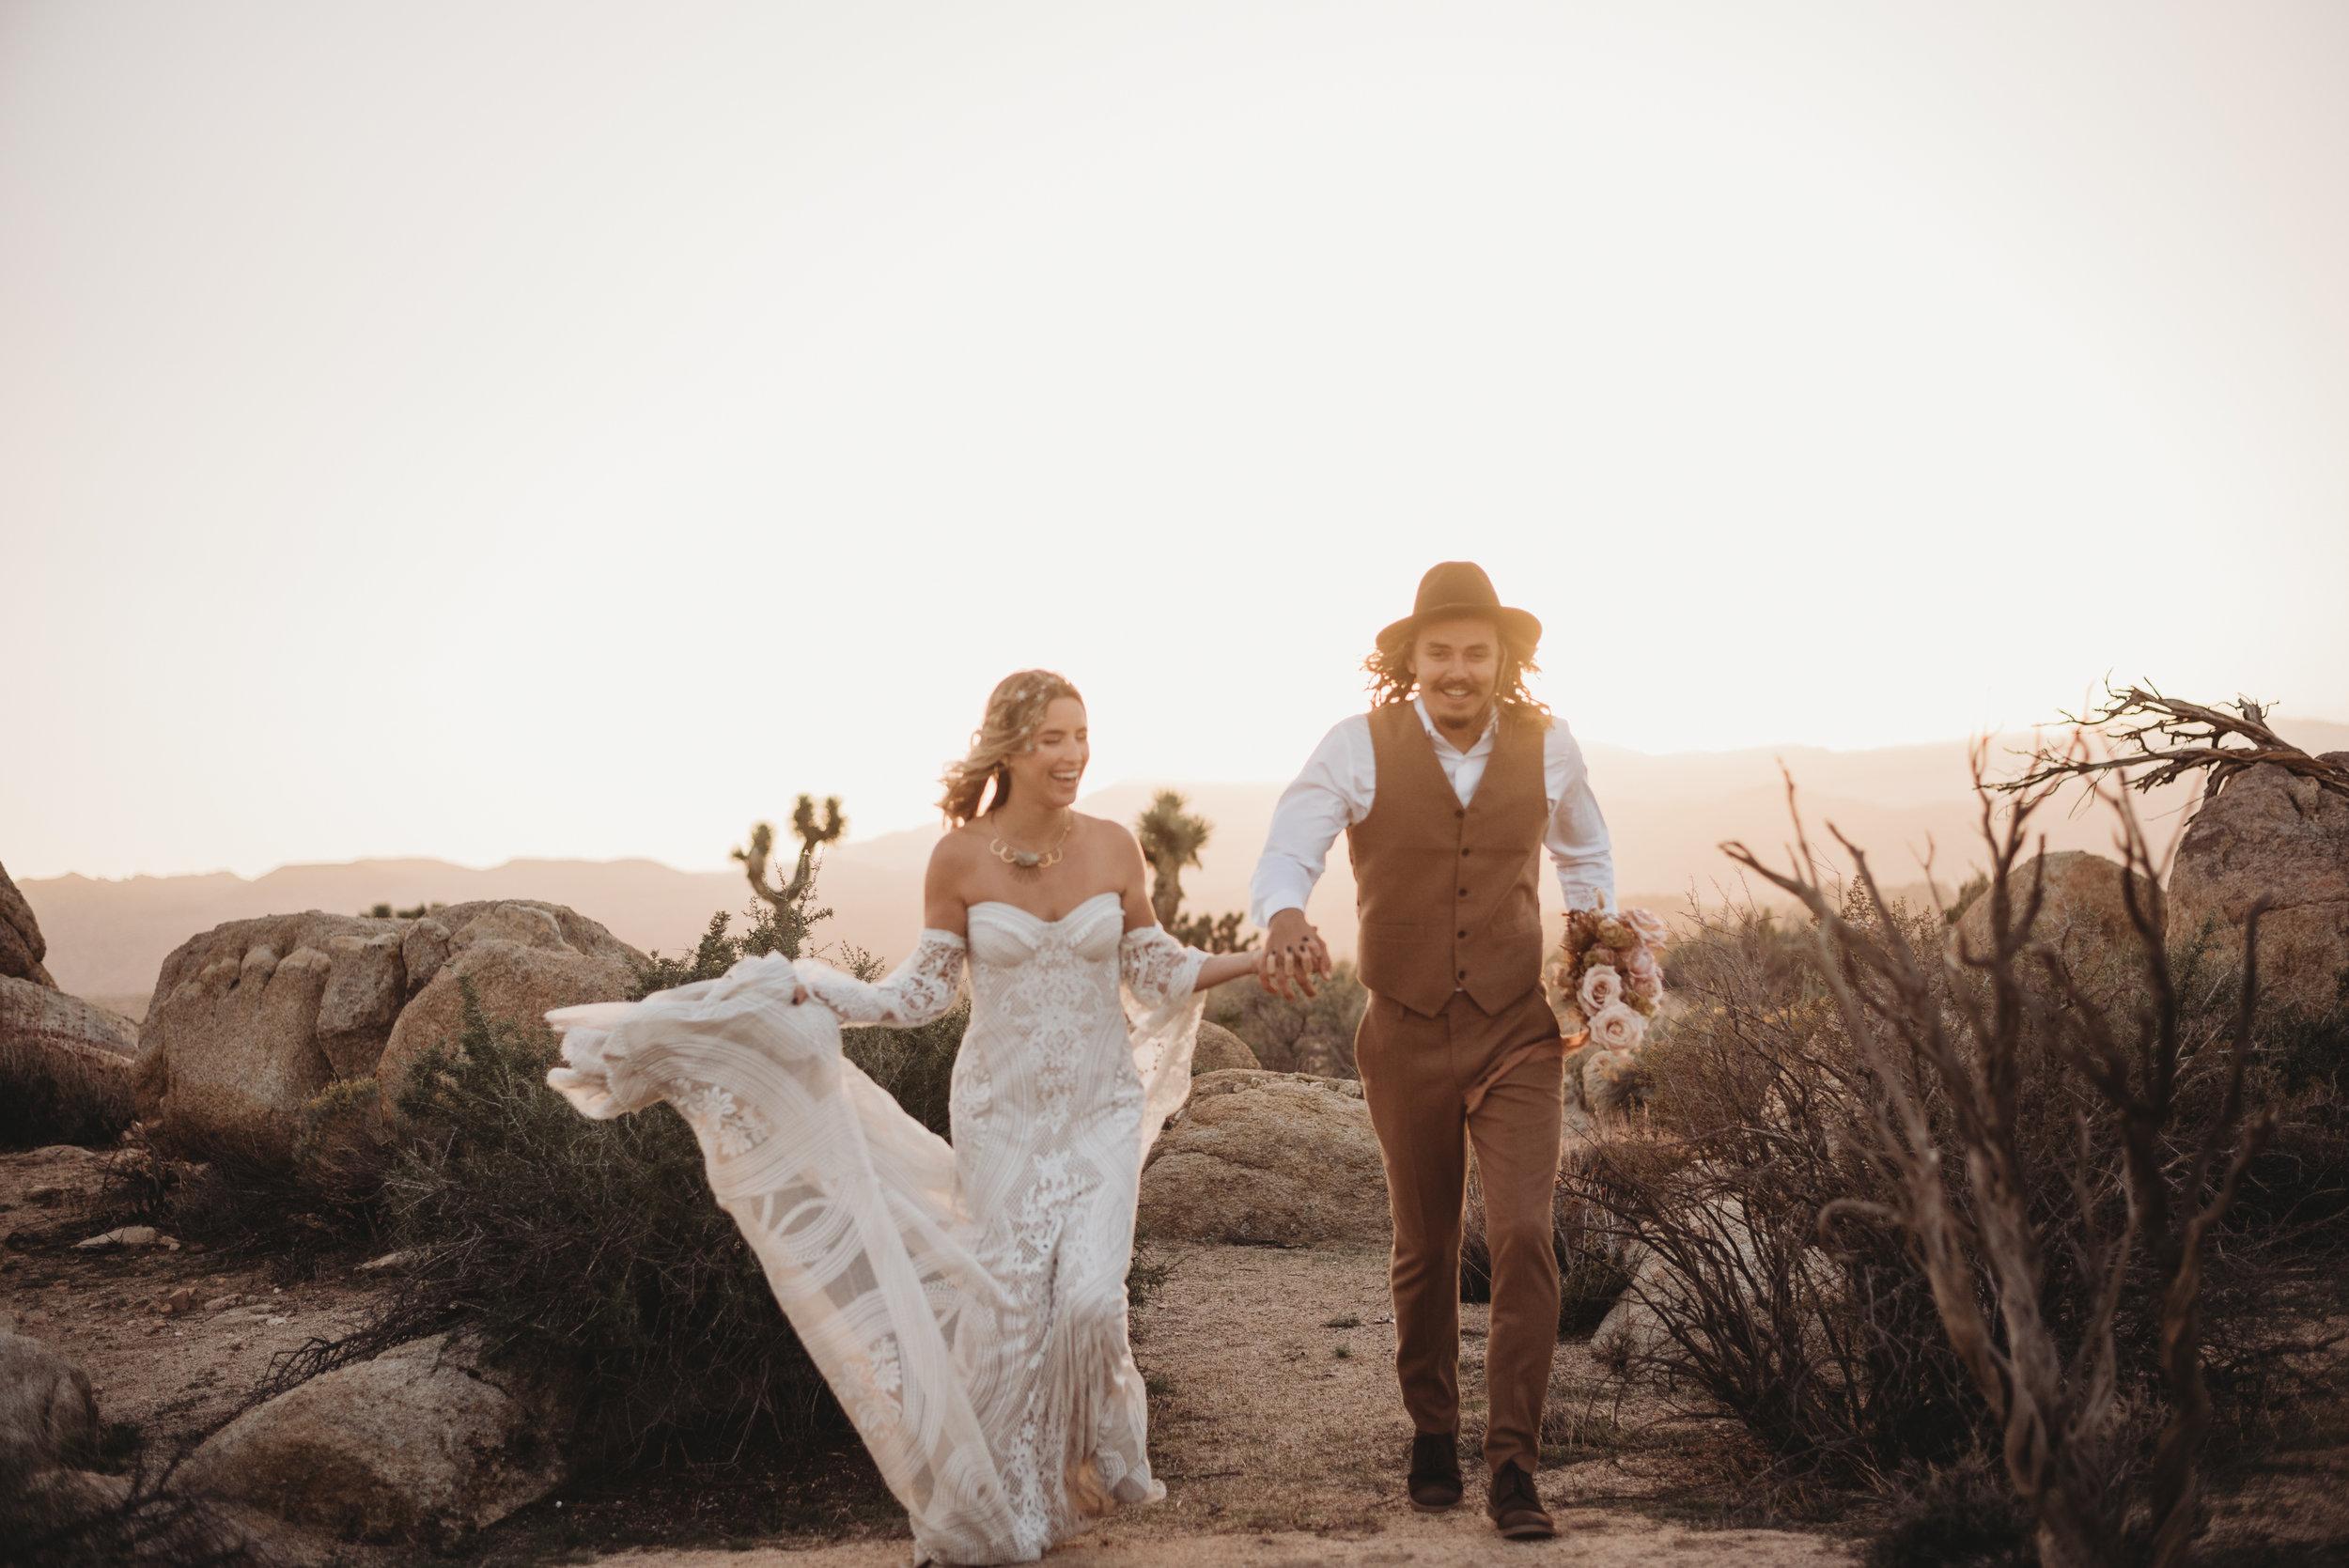 FortSt.John_photographer_TyraEPhotography_Wedding_Couple_Family_Photograhy_DawsonCreek_Elopement_Bride_Boduoir_Portraits-8465.jpg